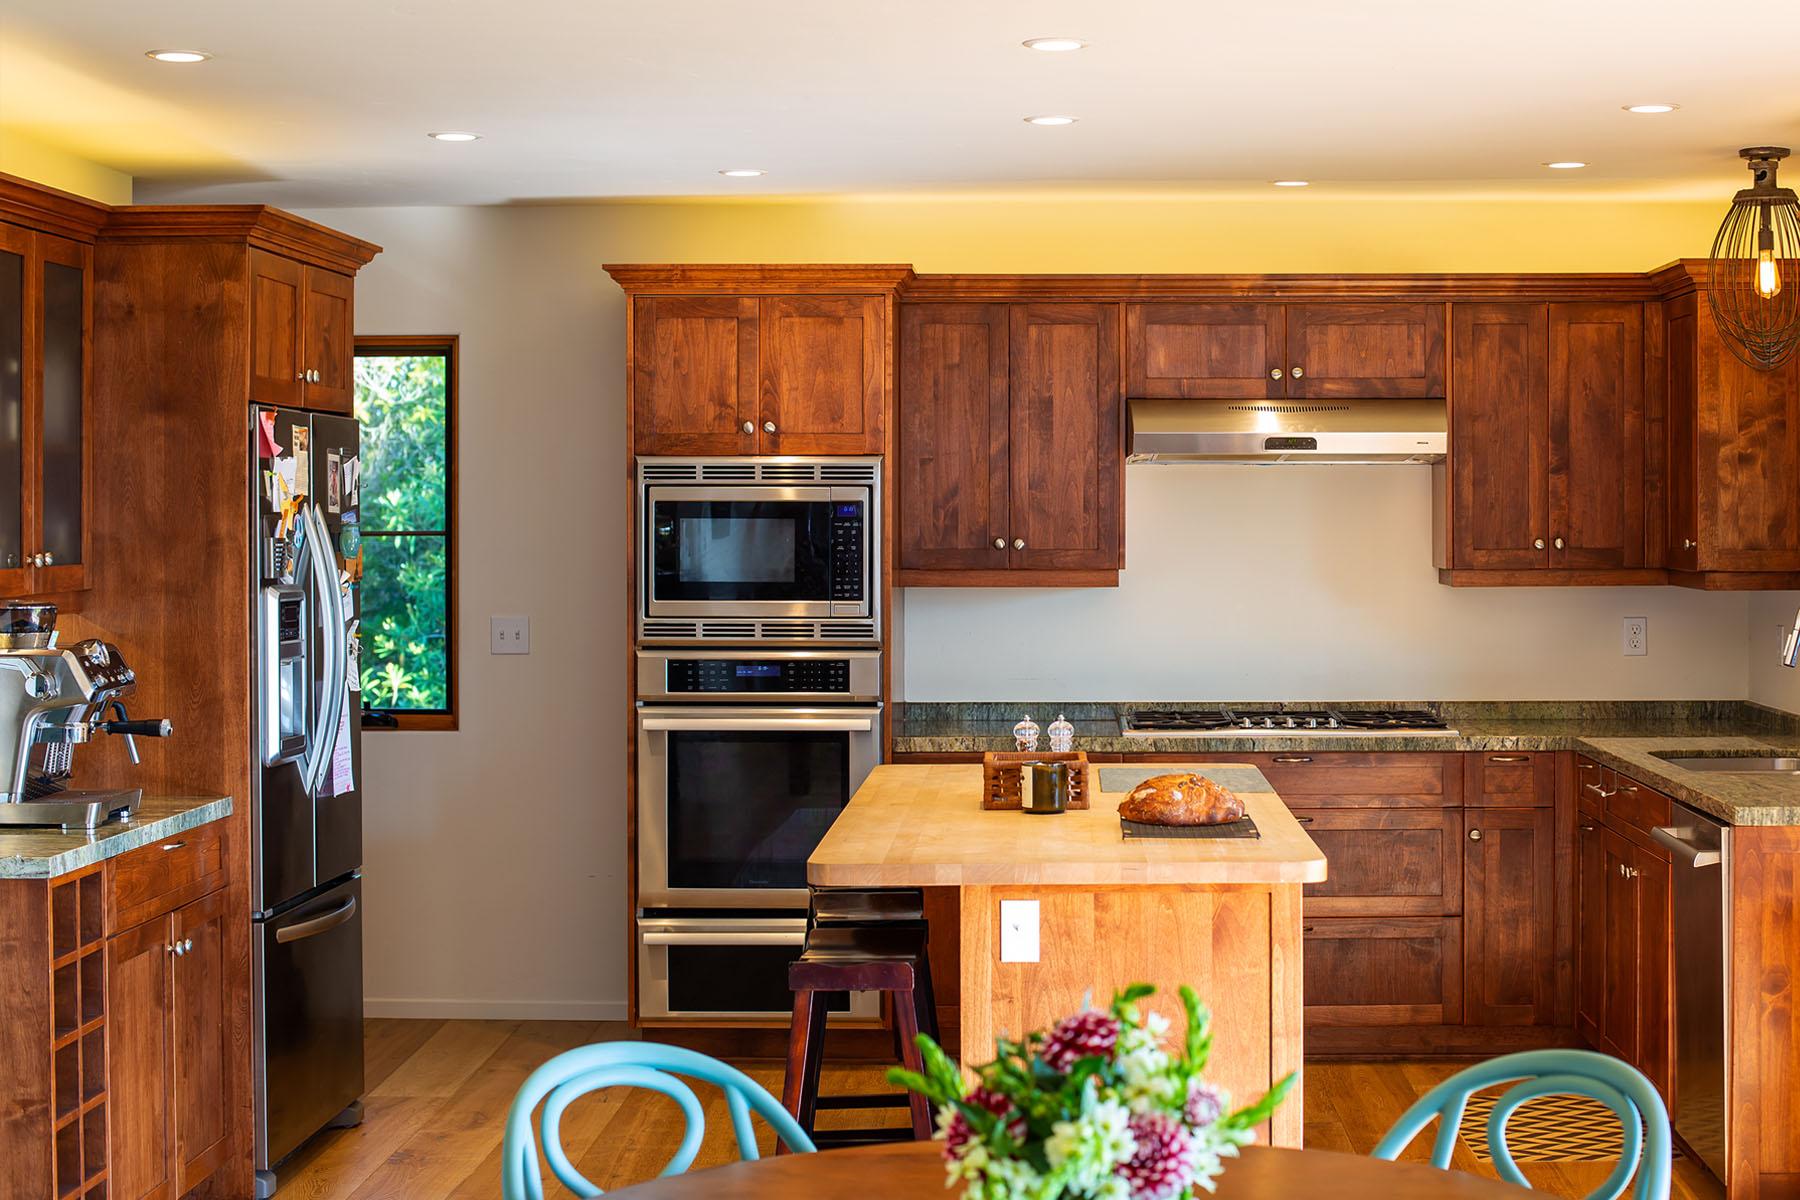 Campanil kitchen